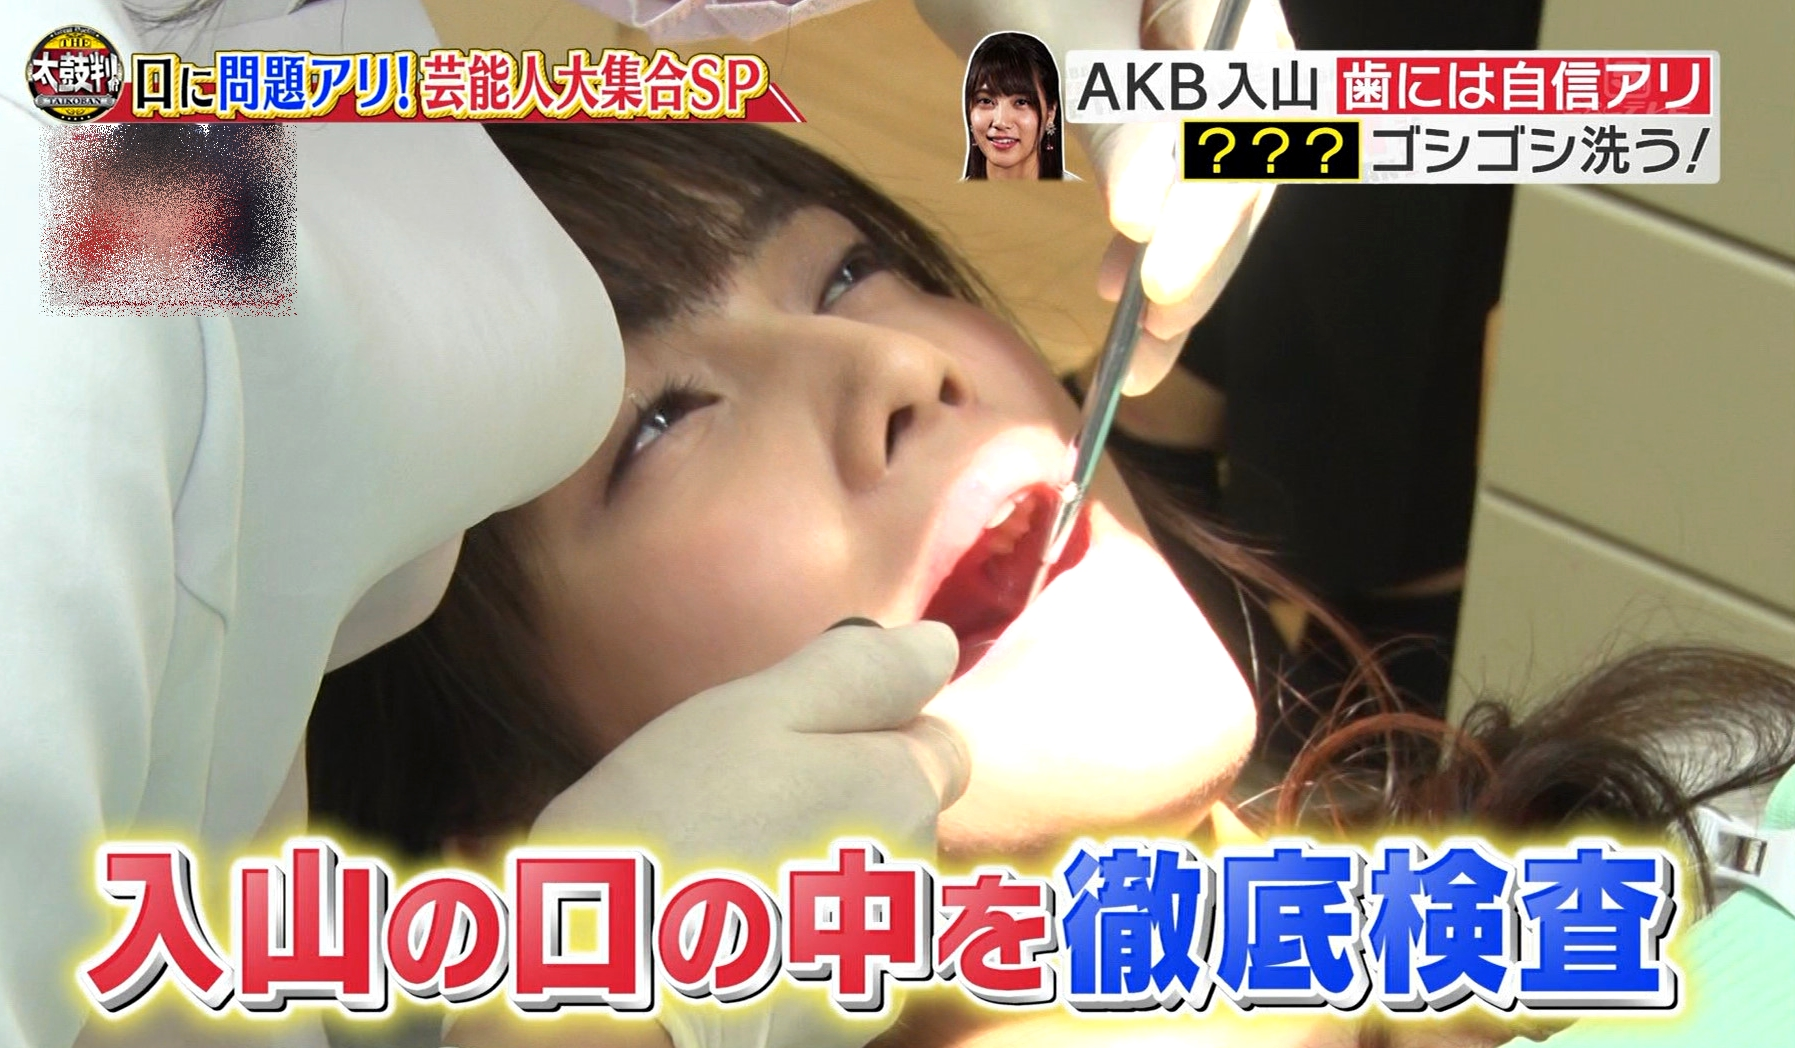 入山杏奈の口内観察 (1)